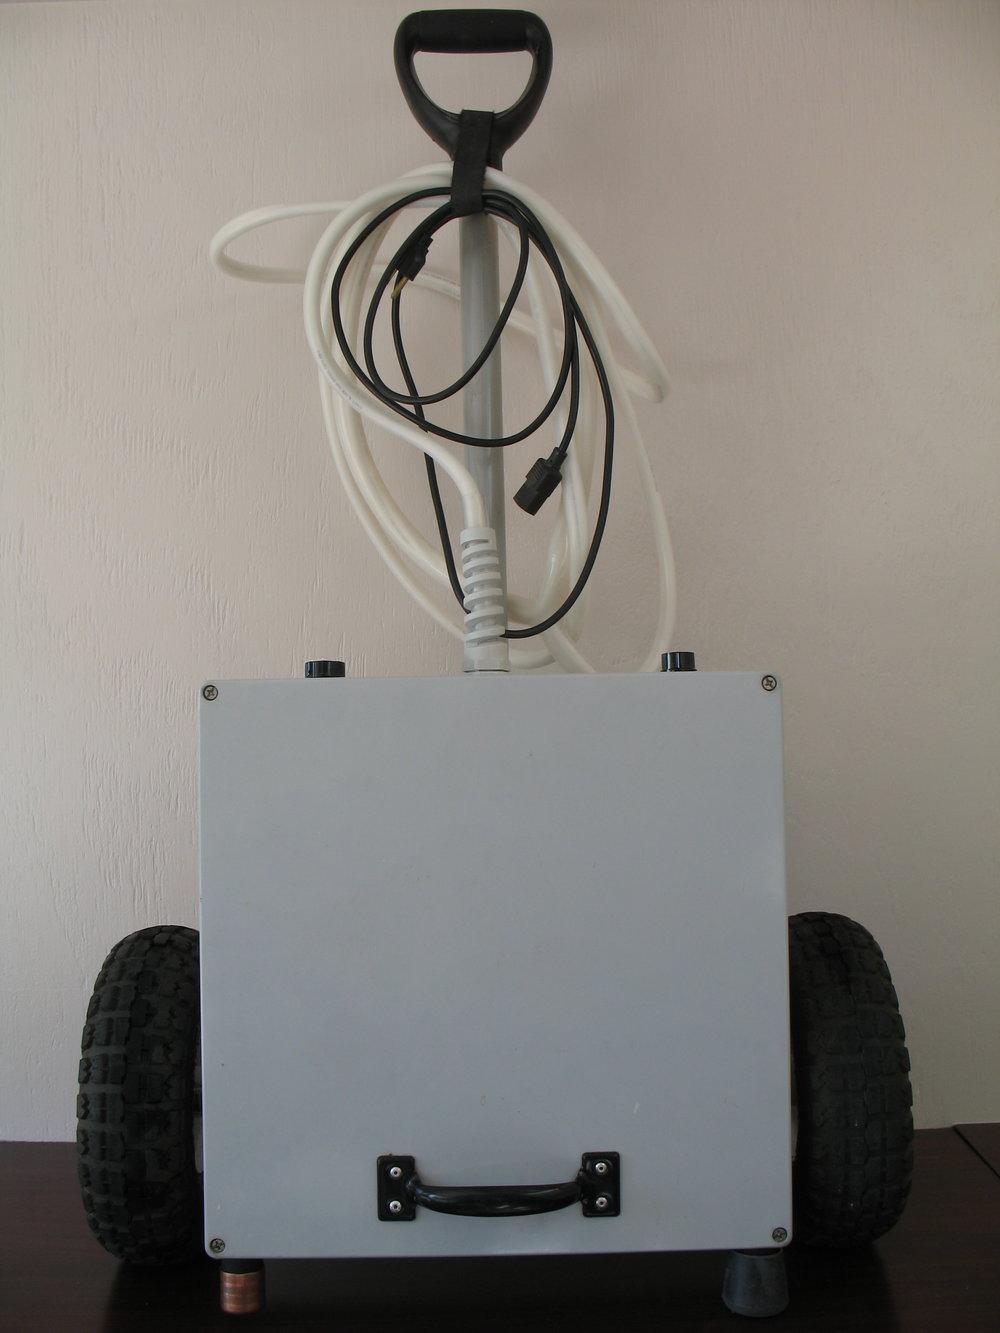 EquiPulse - Circa 2007 - 45 lbs